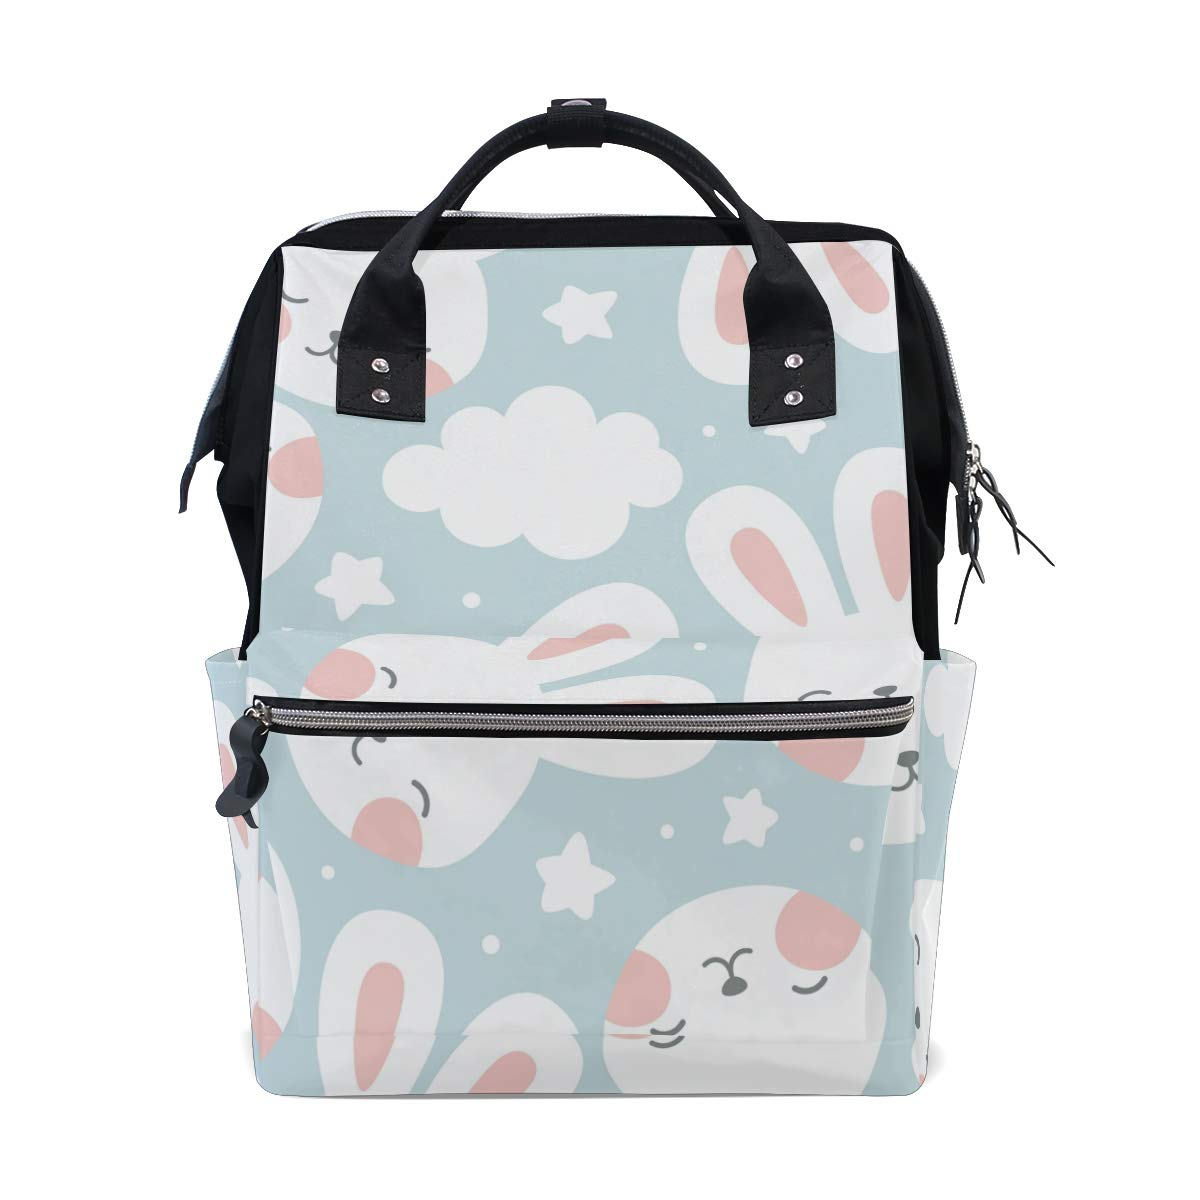 MERRYSUGAR Diaper Bag School Backpack Baby Bag Rabbits Star Blue Large Multifunction Travel Bag Mommy Bag